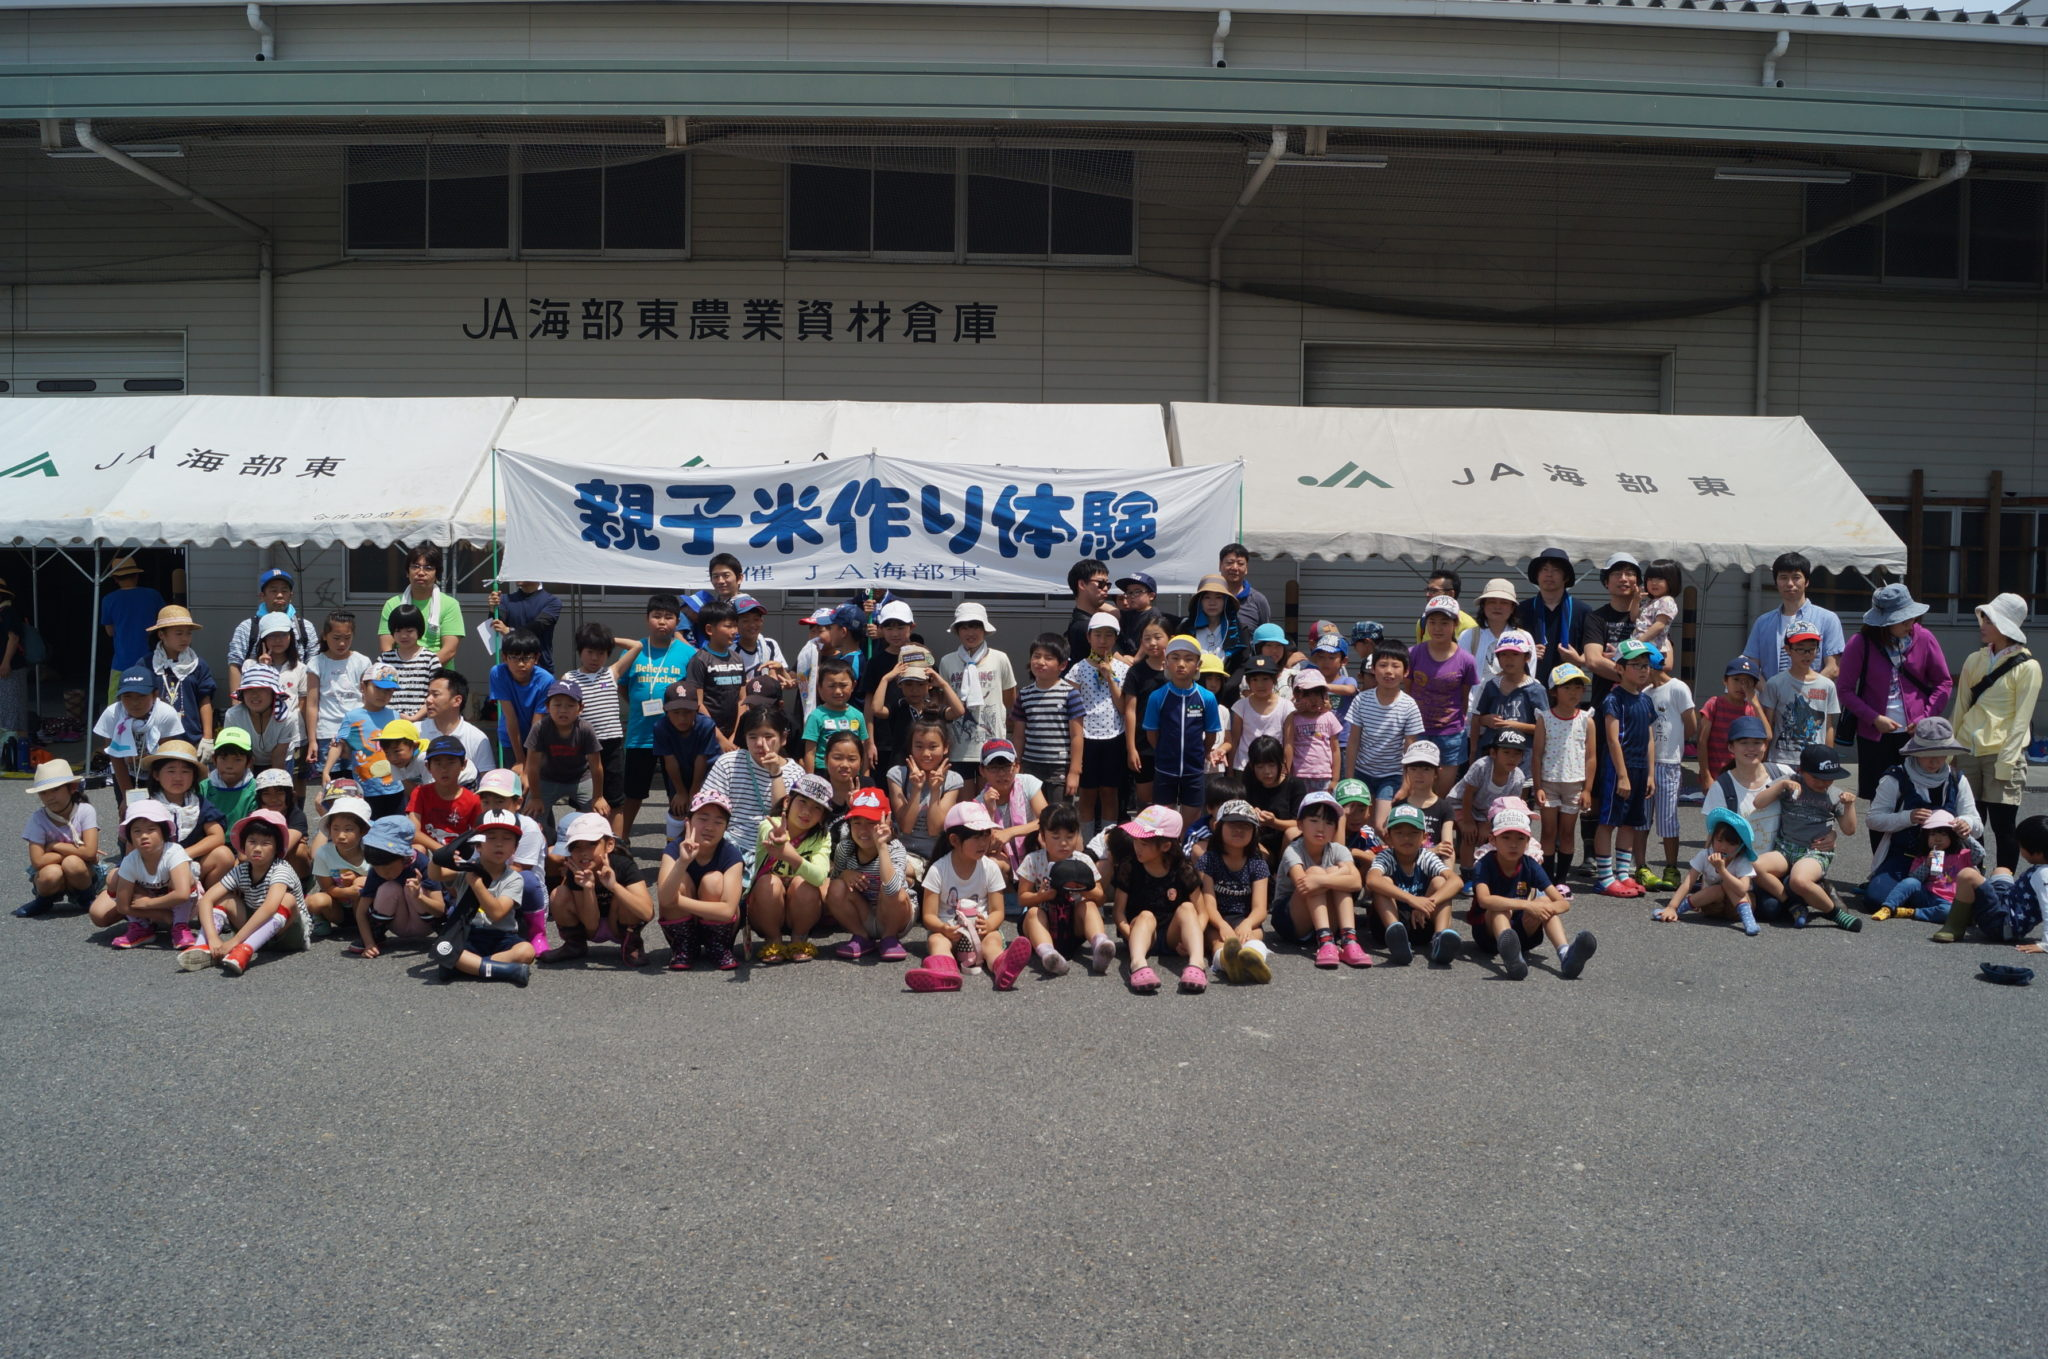 JA 海部東農業協同組合(あまひがし) -保護中: 親子米作り体験2019(田植え)